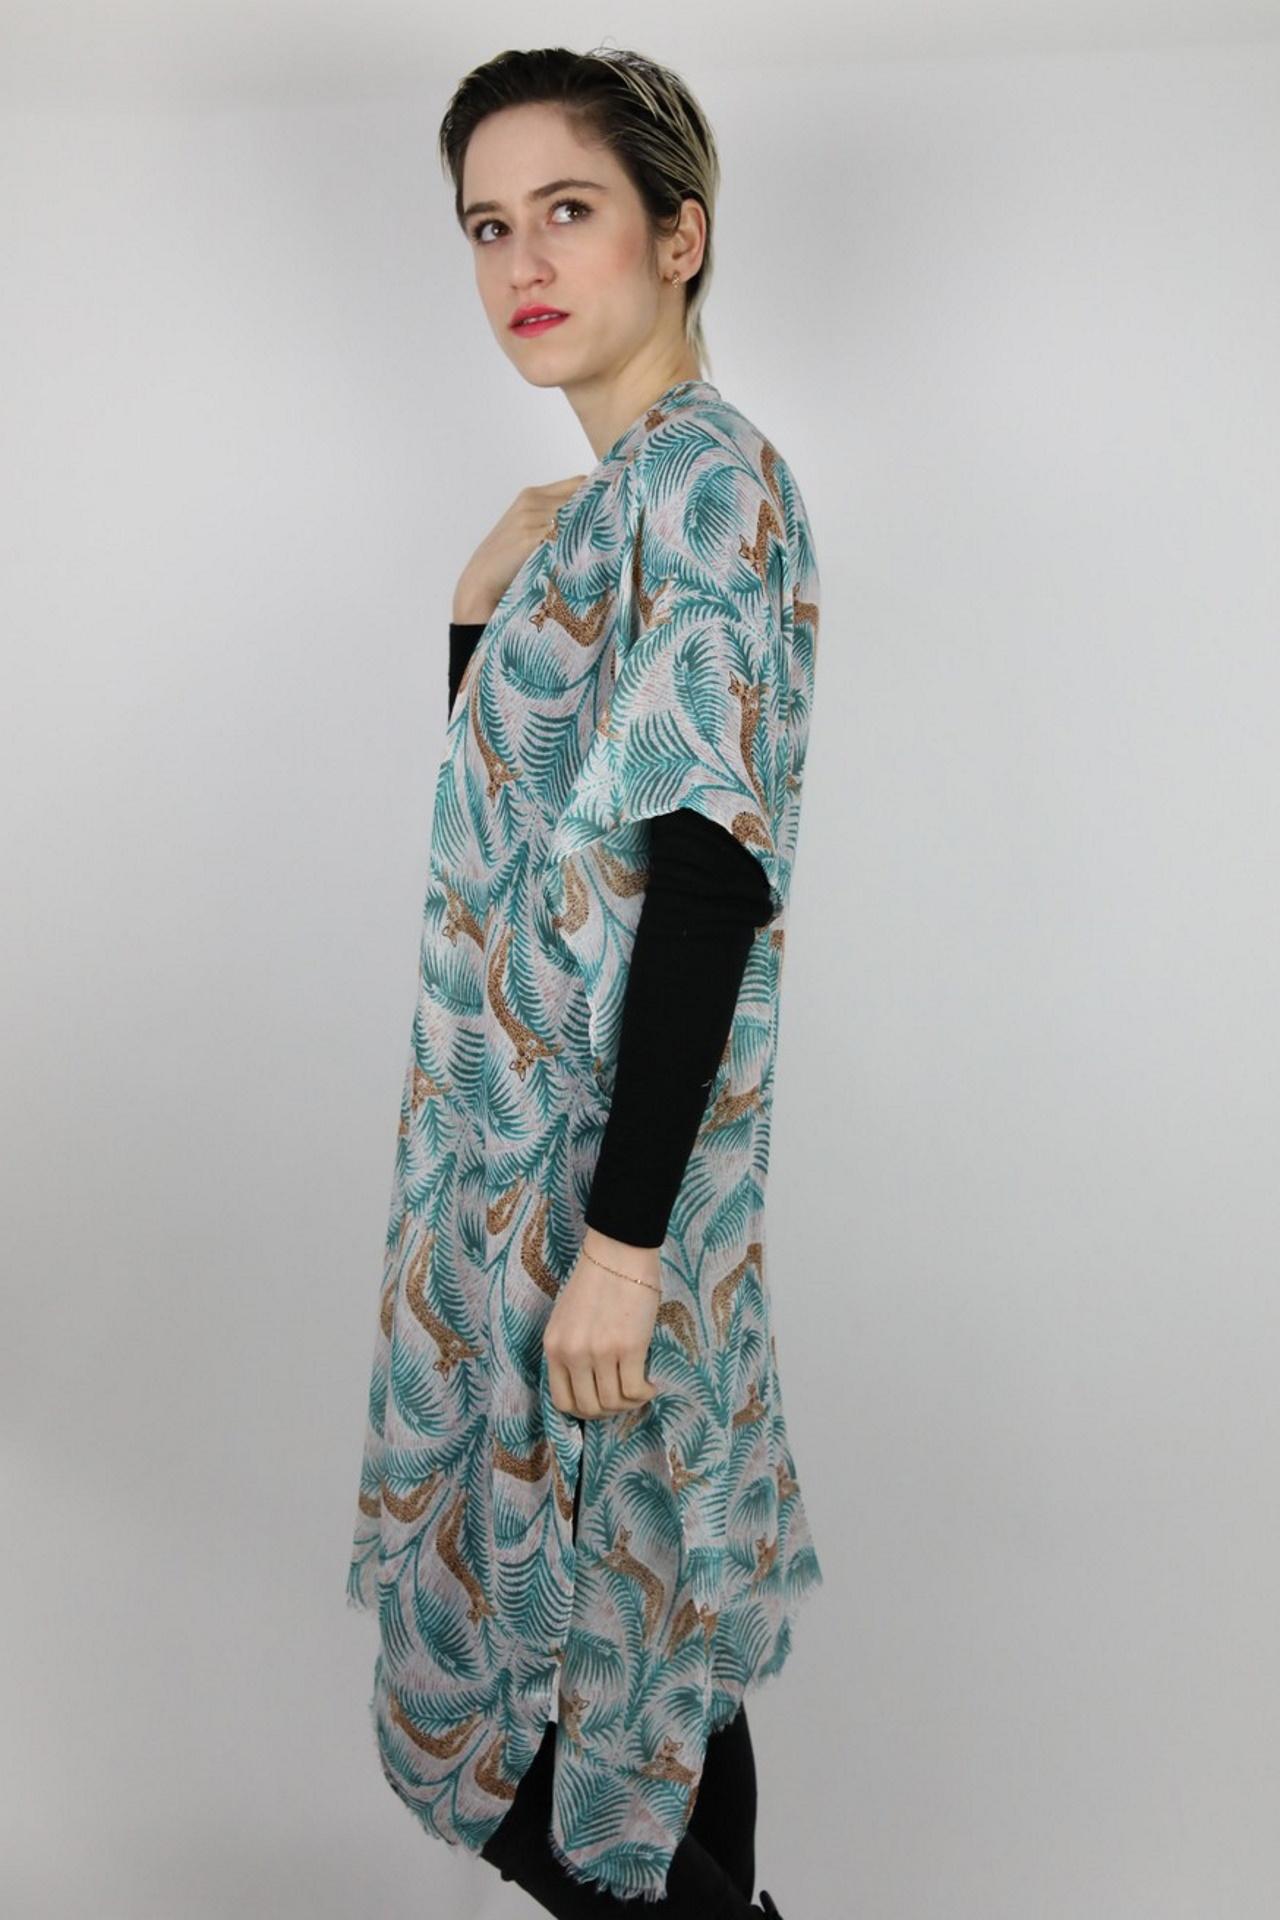 CLOTHES11 STOLA DONNA FOULARD CARDIGAN COPRISPALLE 2 1stAmerican elegante stola da donna foulard cardigan coprispalle